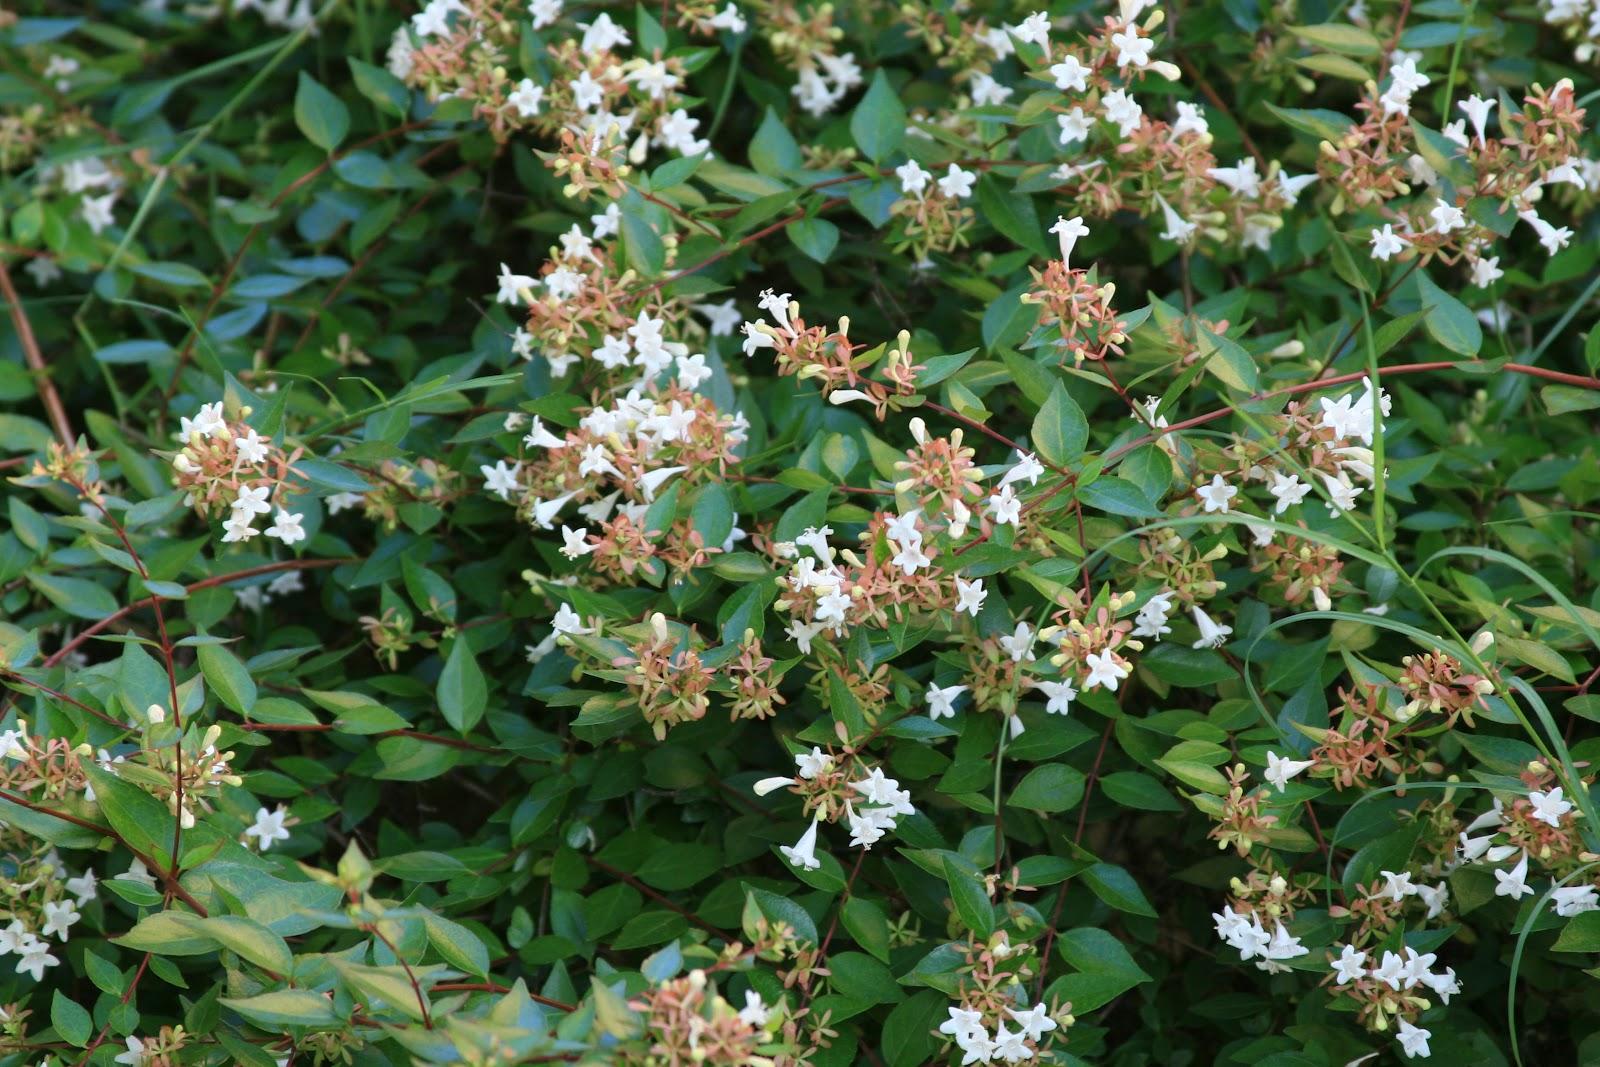 abelia x grandiflora usda hardiness zones 6 9